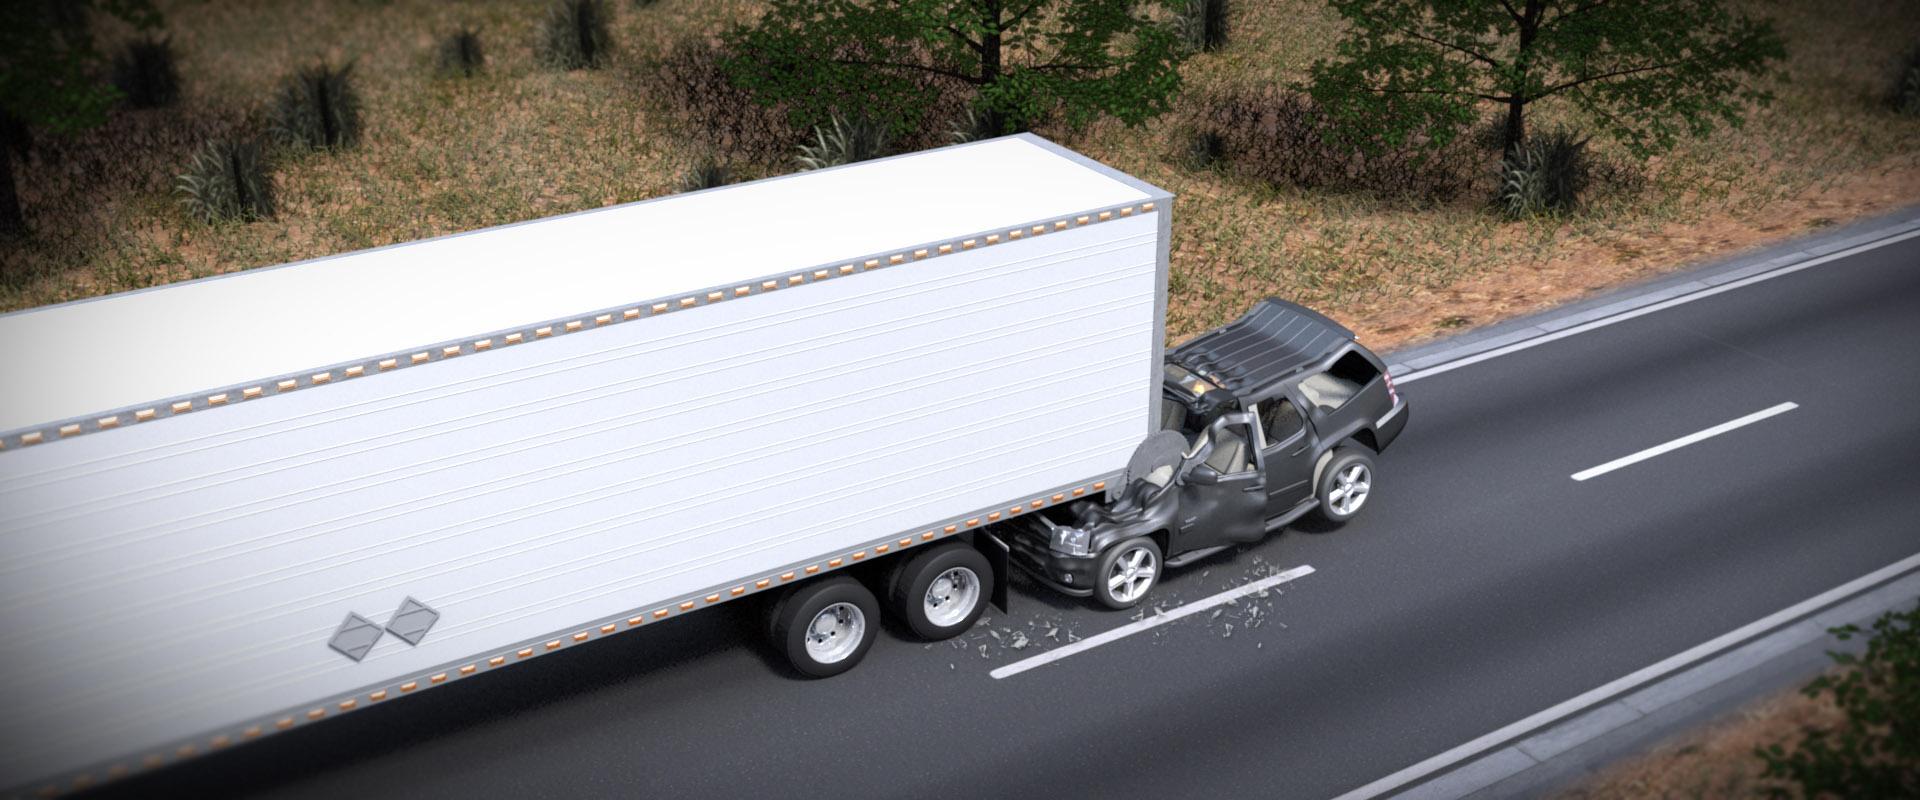 truckingAccidentSlider_001